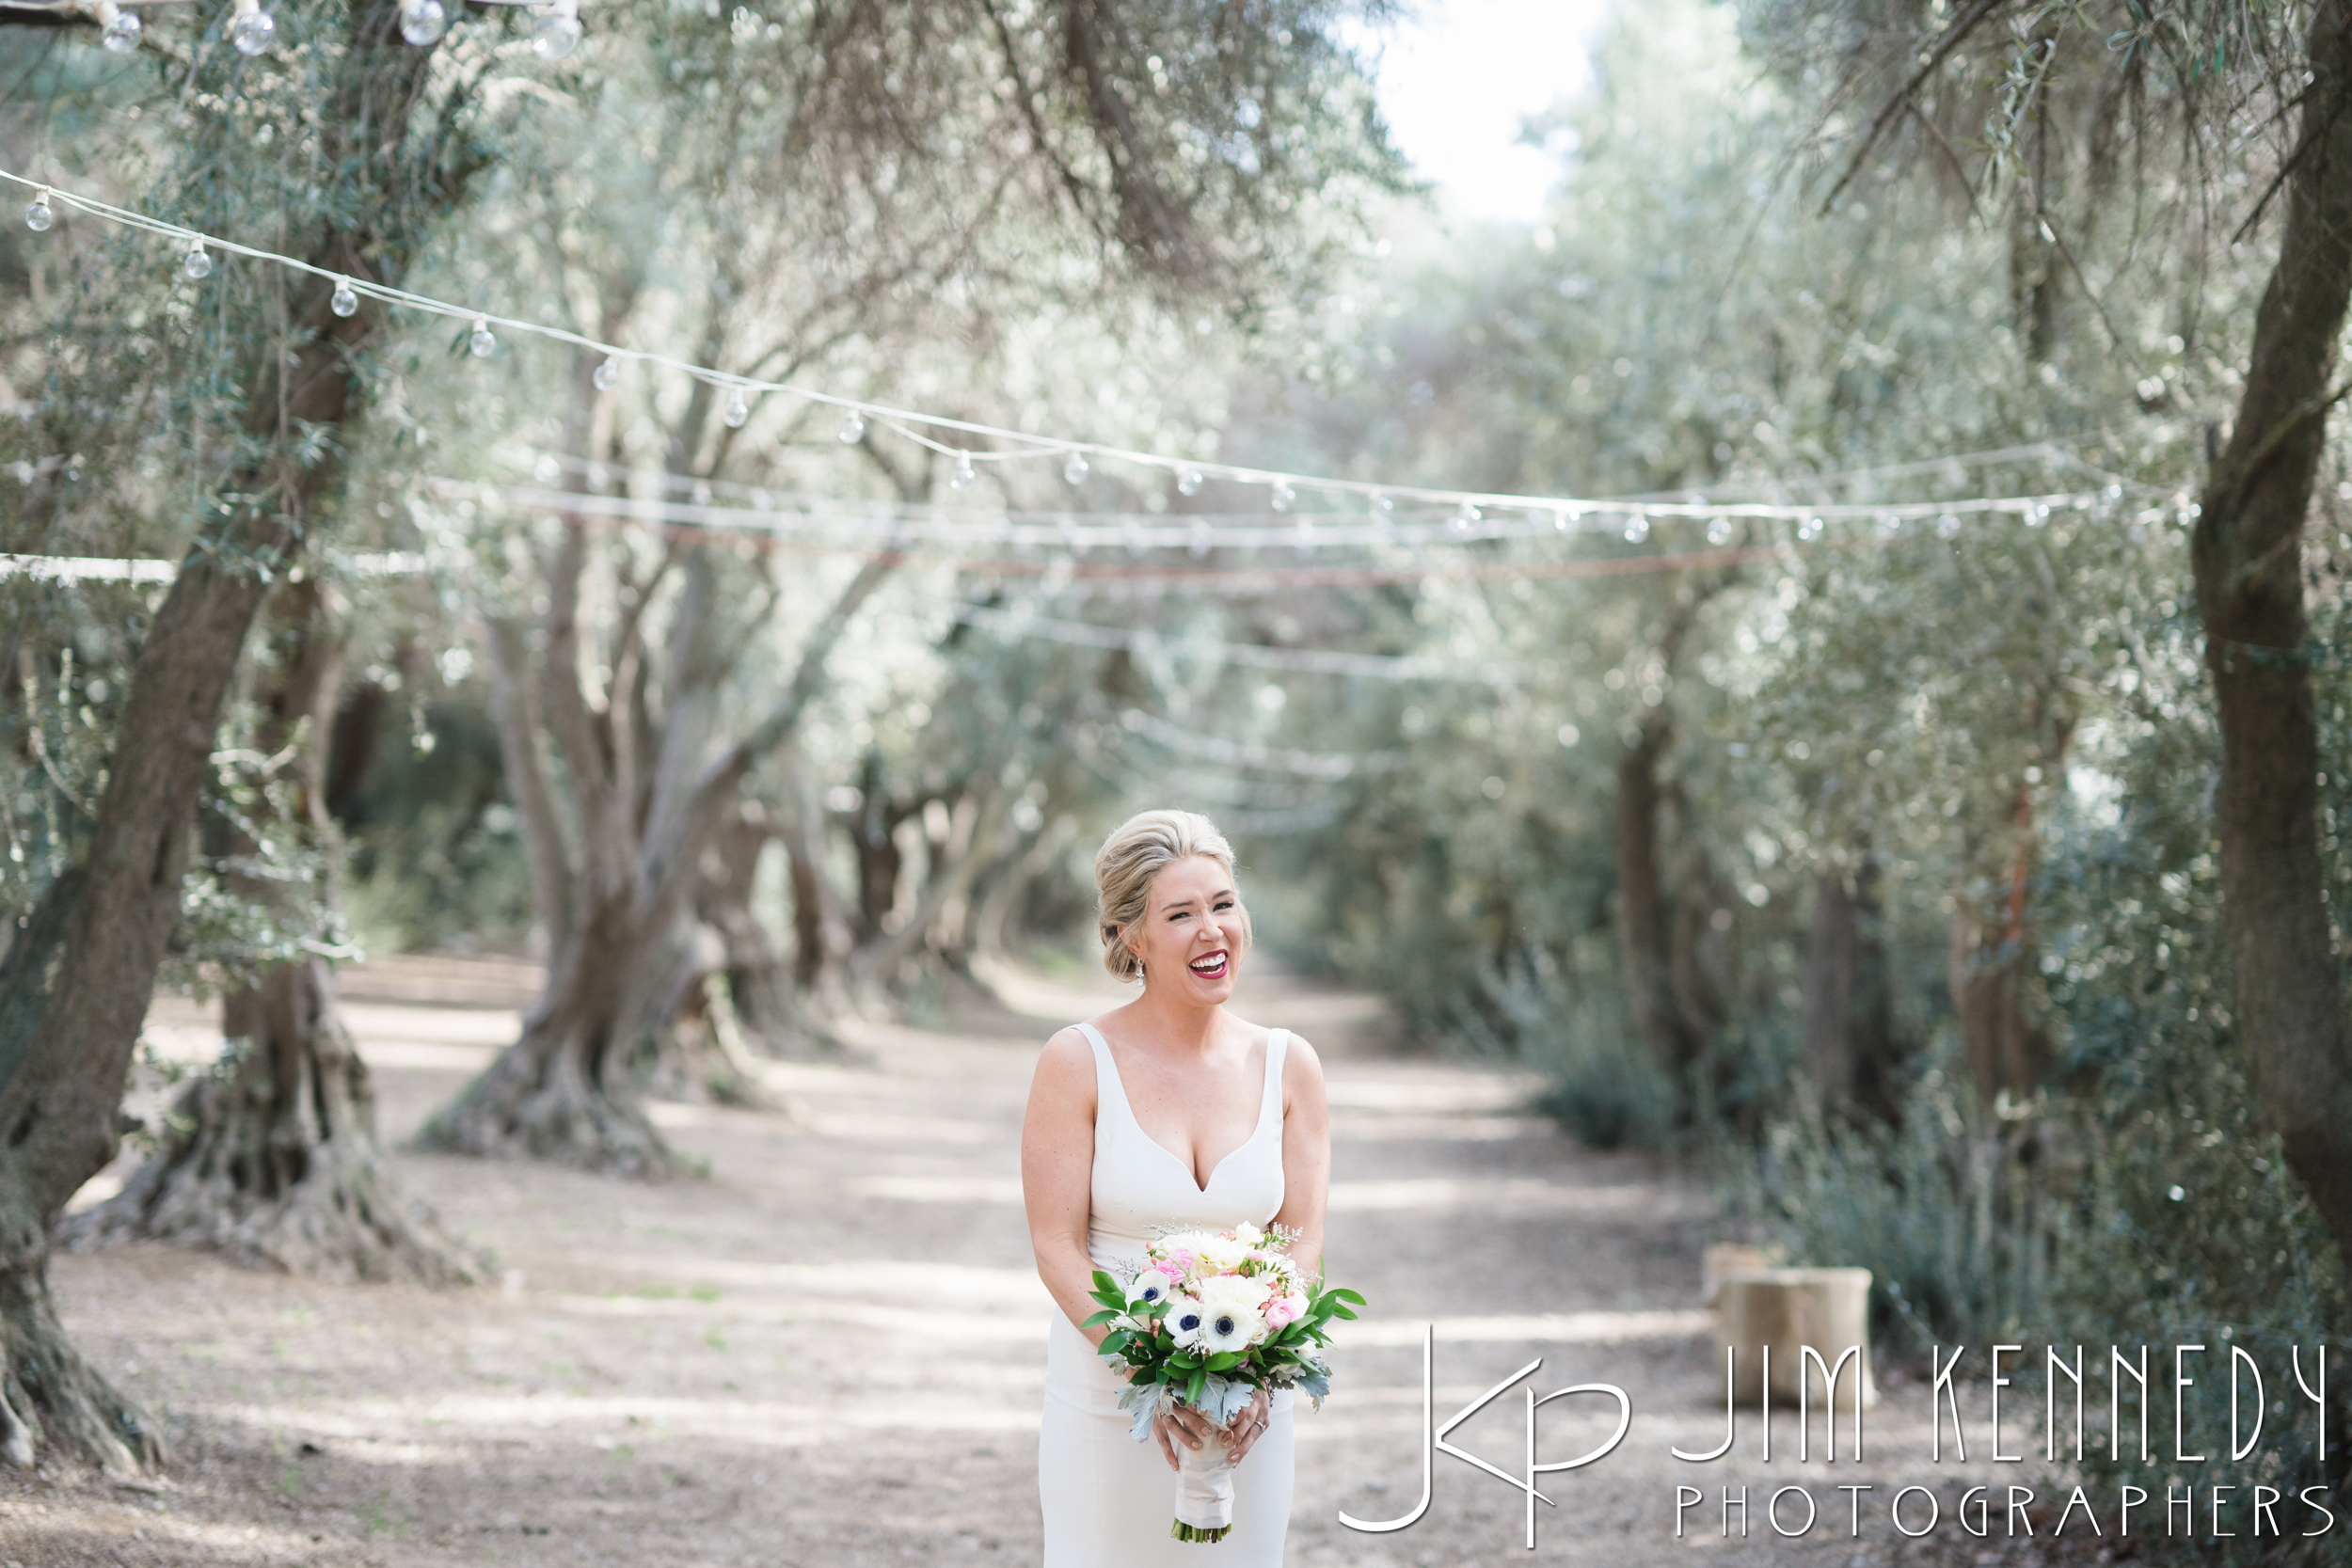 jim_kennedy_photographers_highland_springs_wedding_caitlyn_0058.jpg